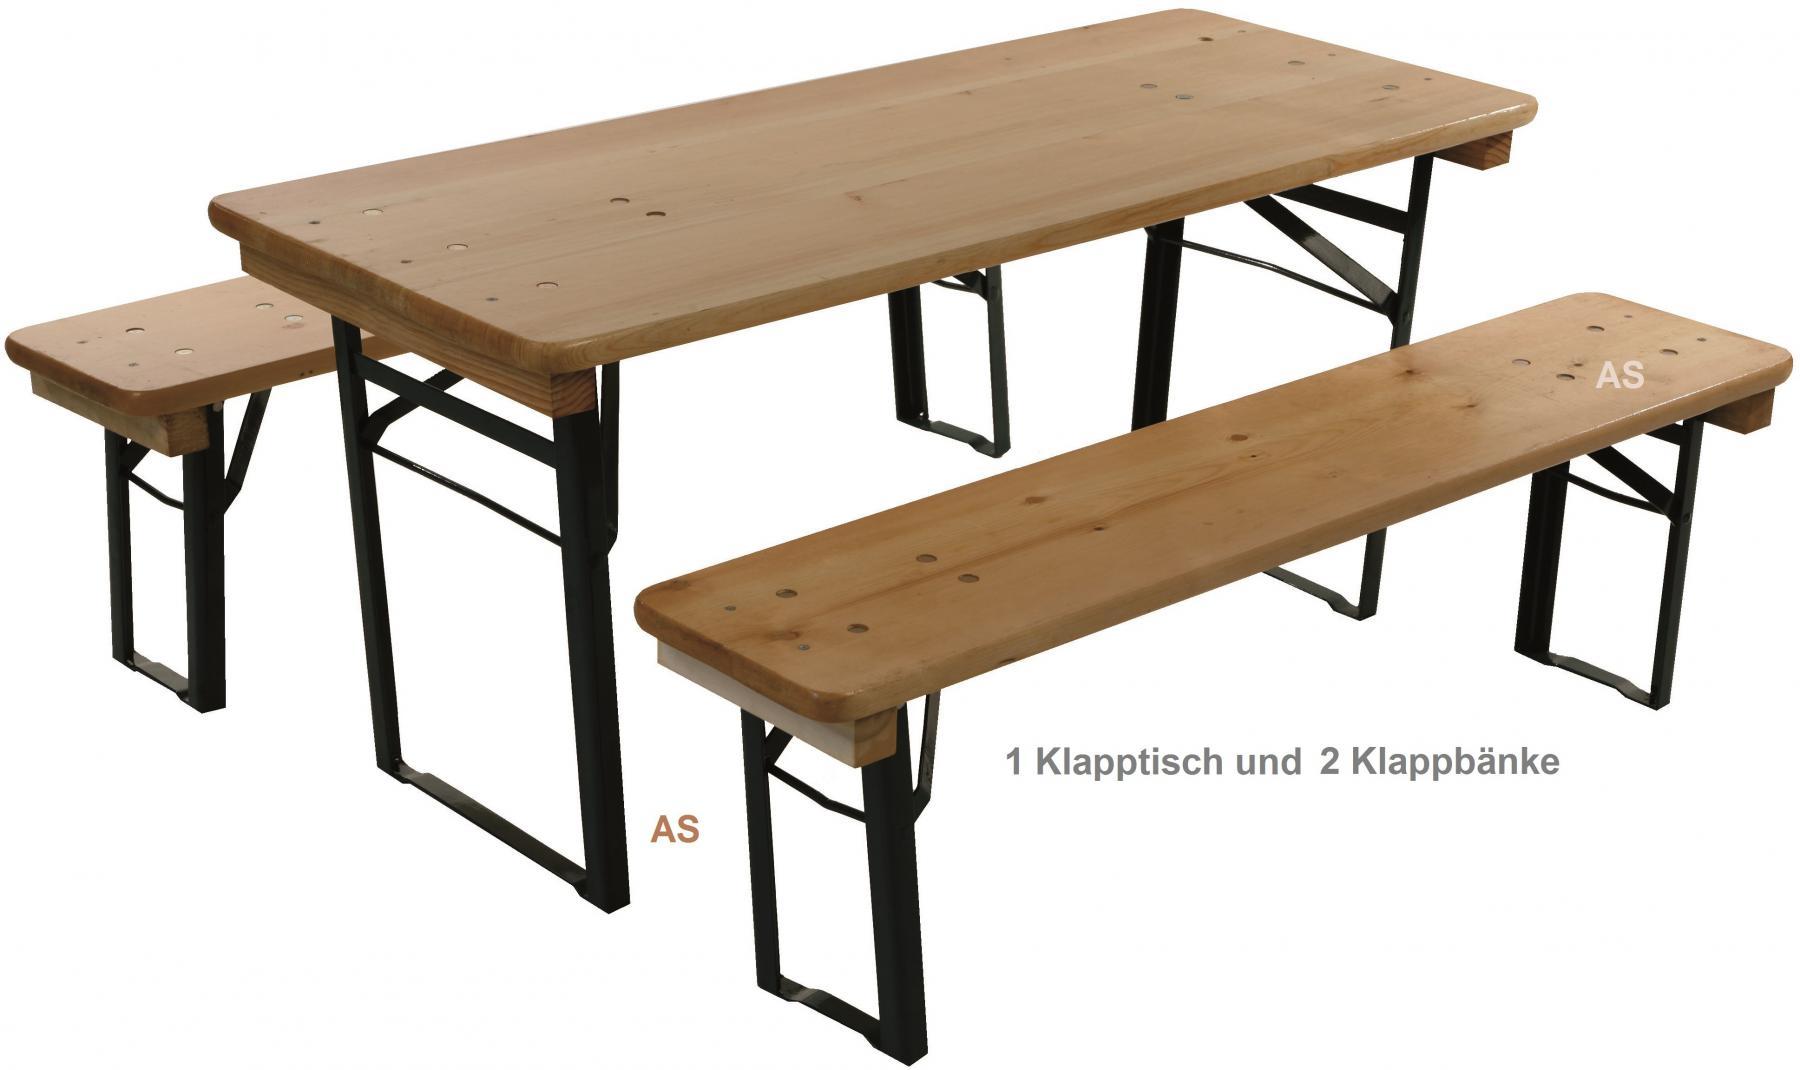 Kindersitzgarnitur 3 Teilig Kindersitzgruppe Tischgruppe Tisch 2